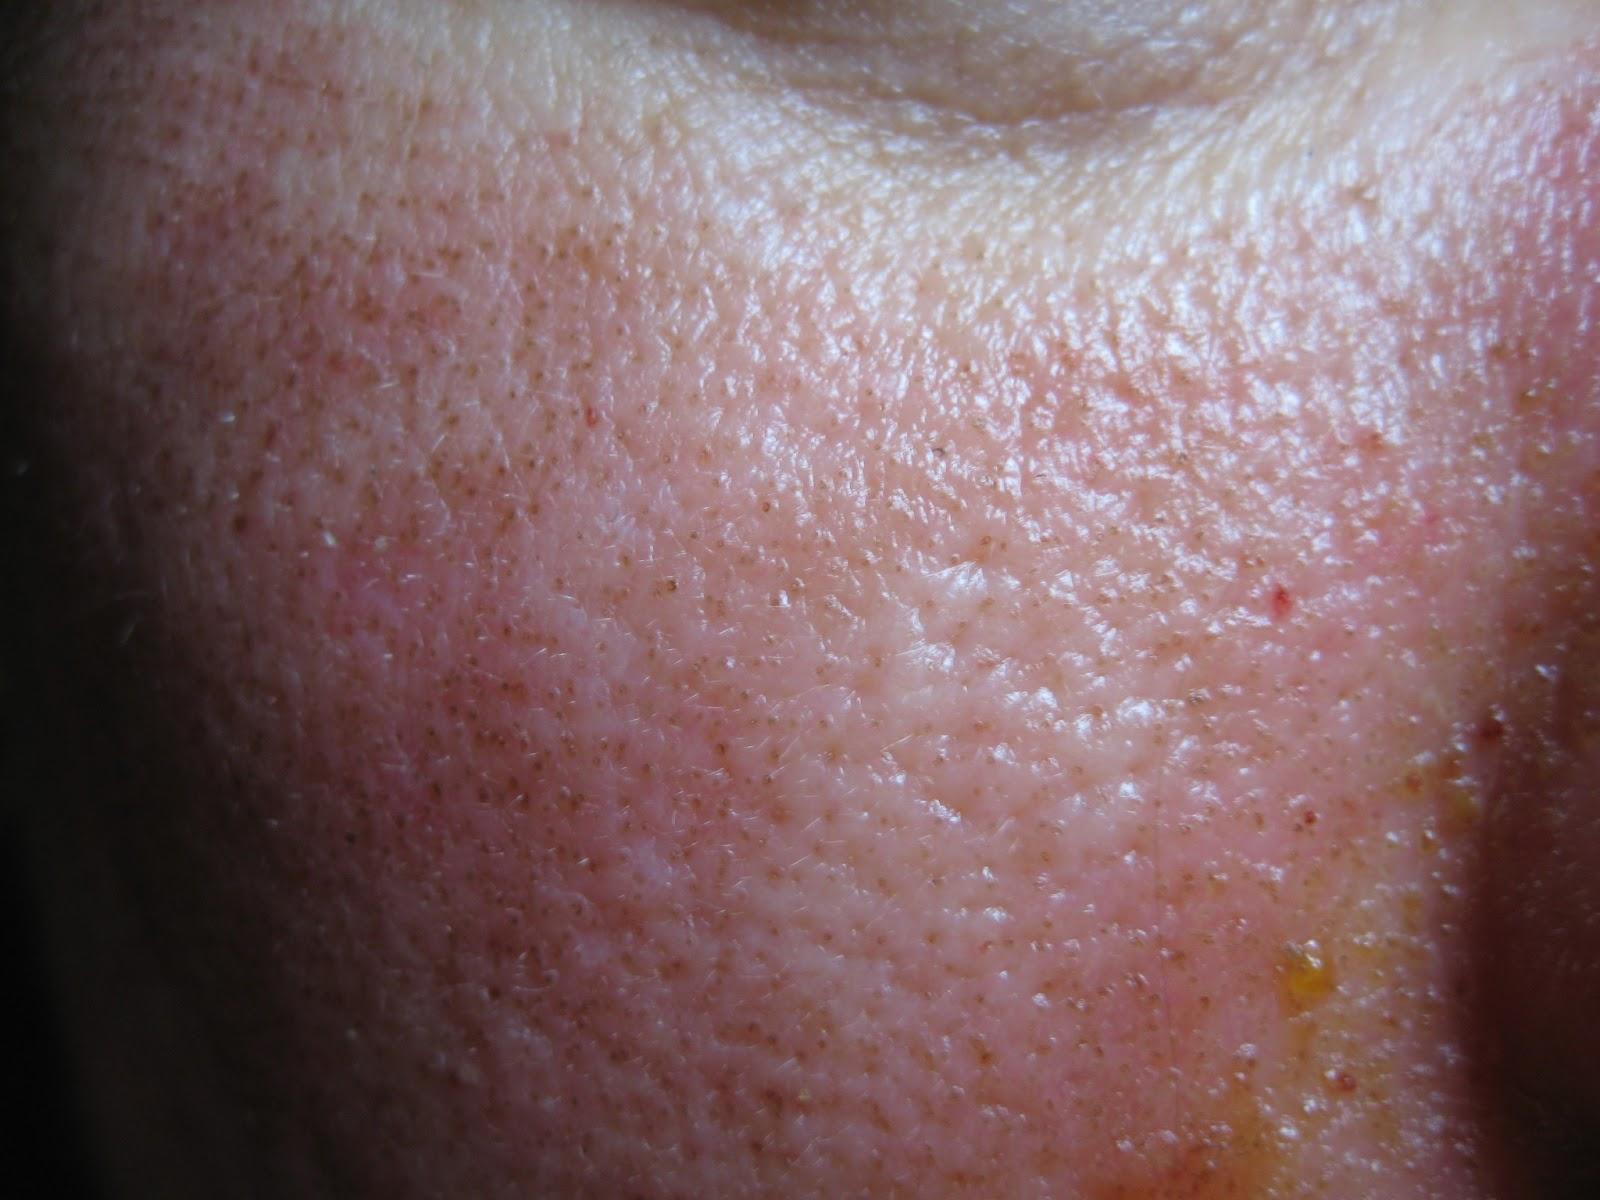 Fibroepithelialis papilloma jelentése